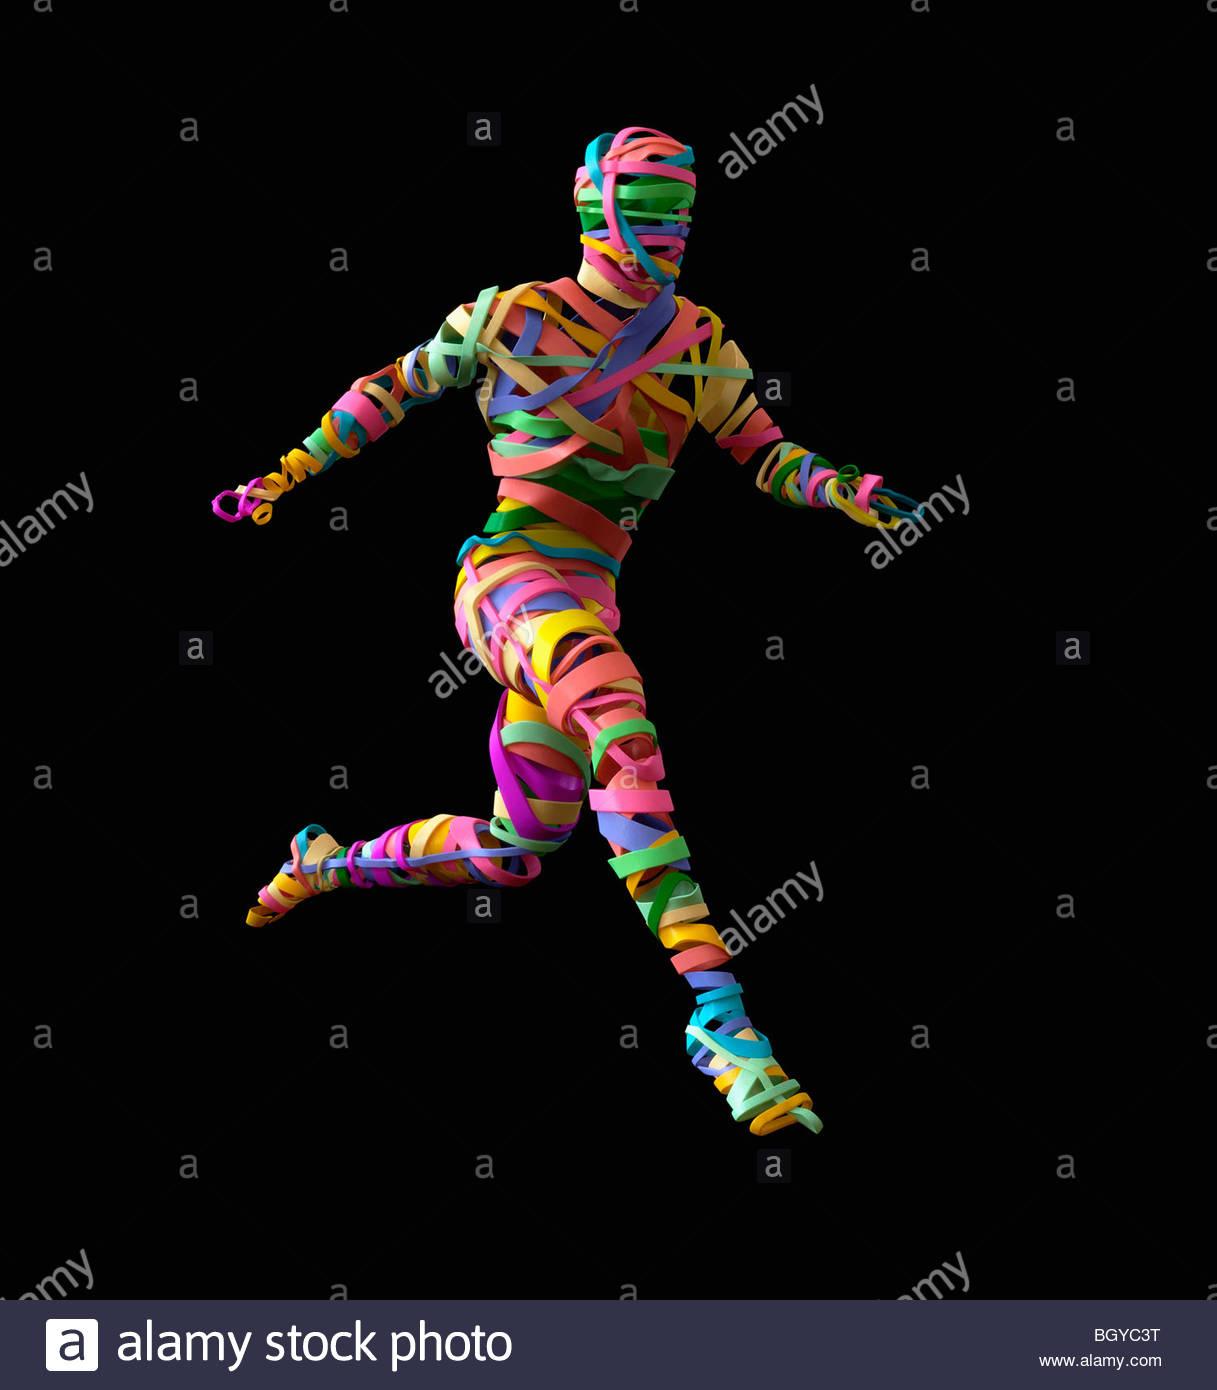 Persona formada por bandas de goma Imagen De Stock